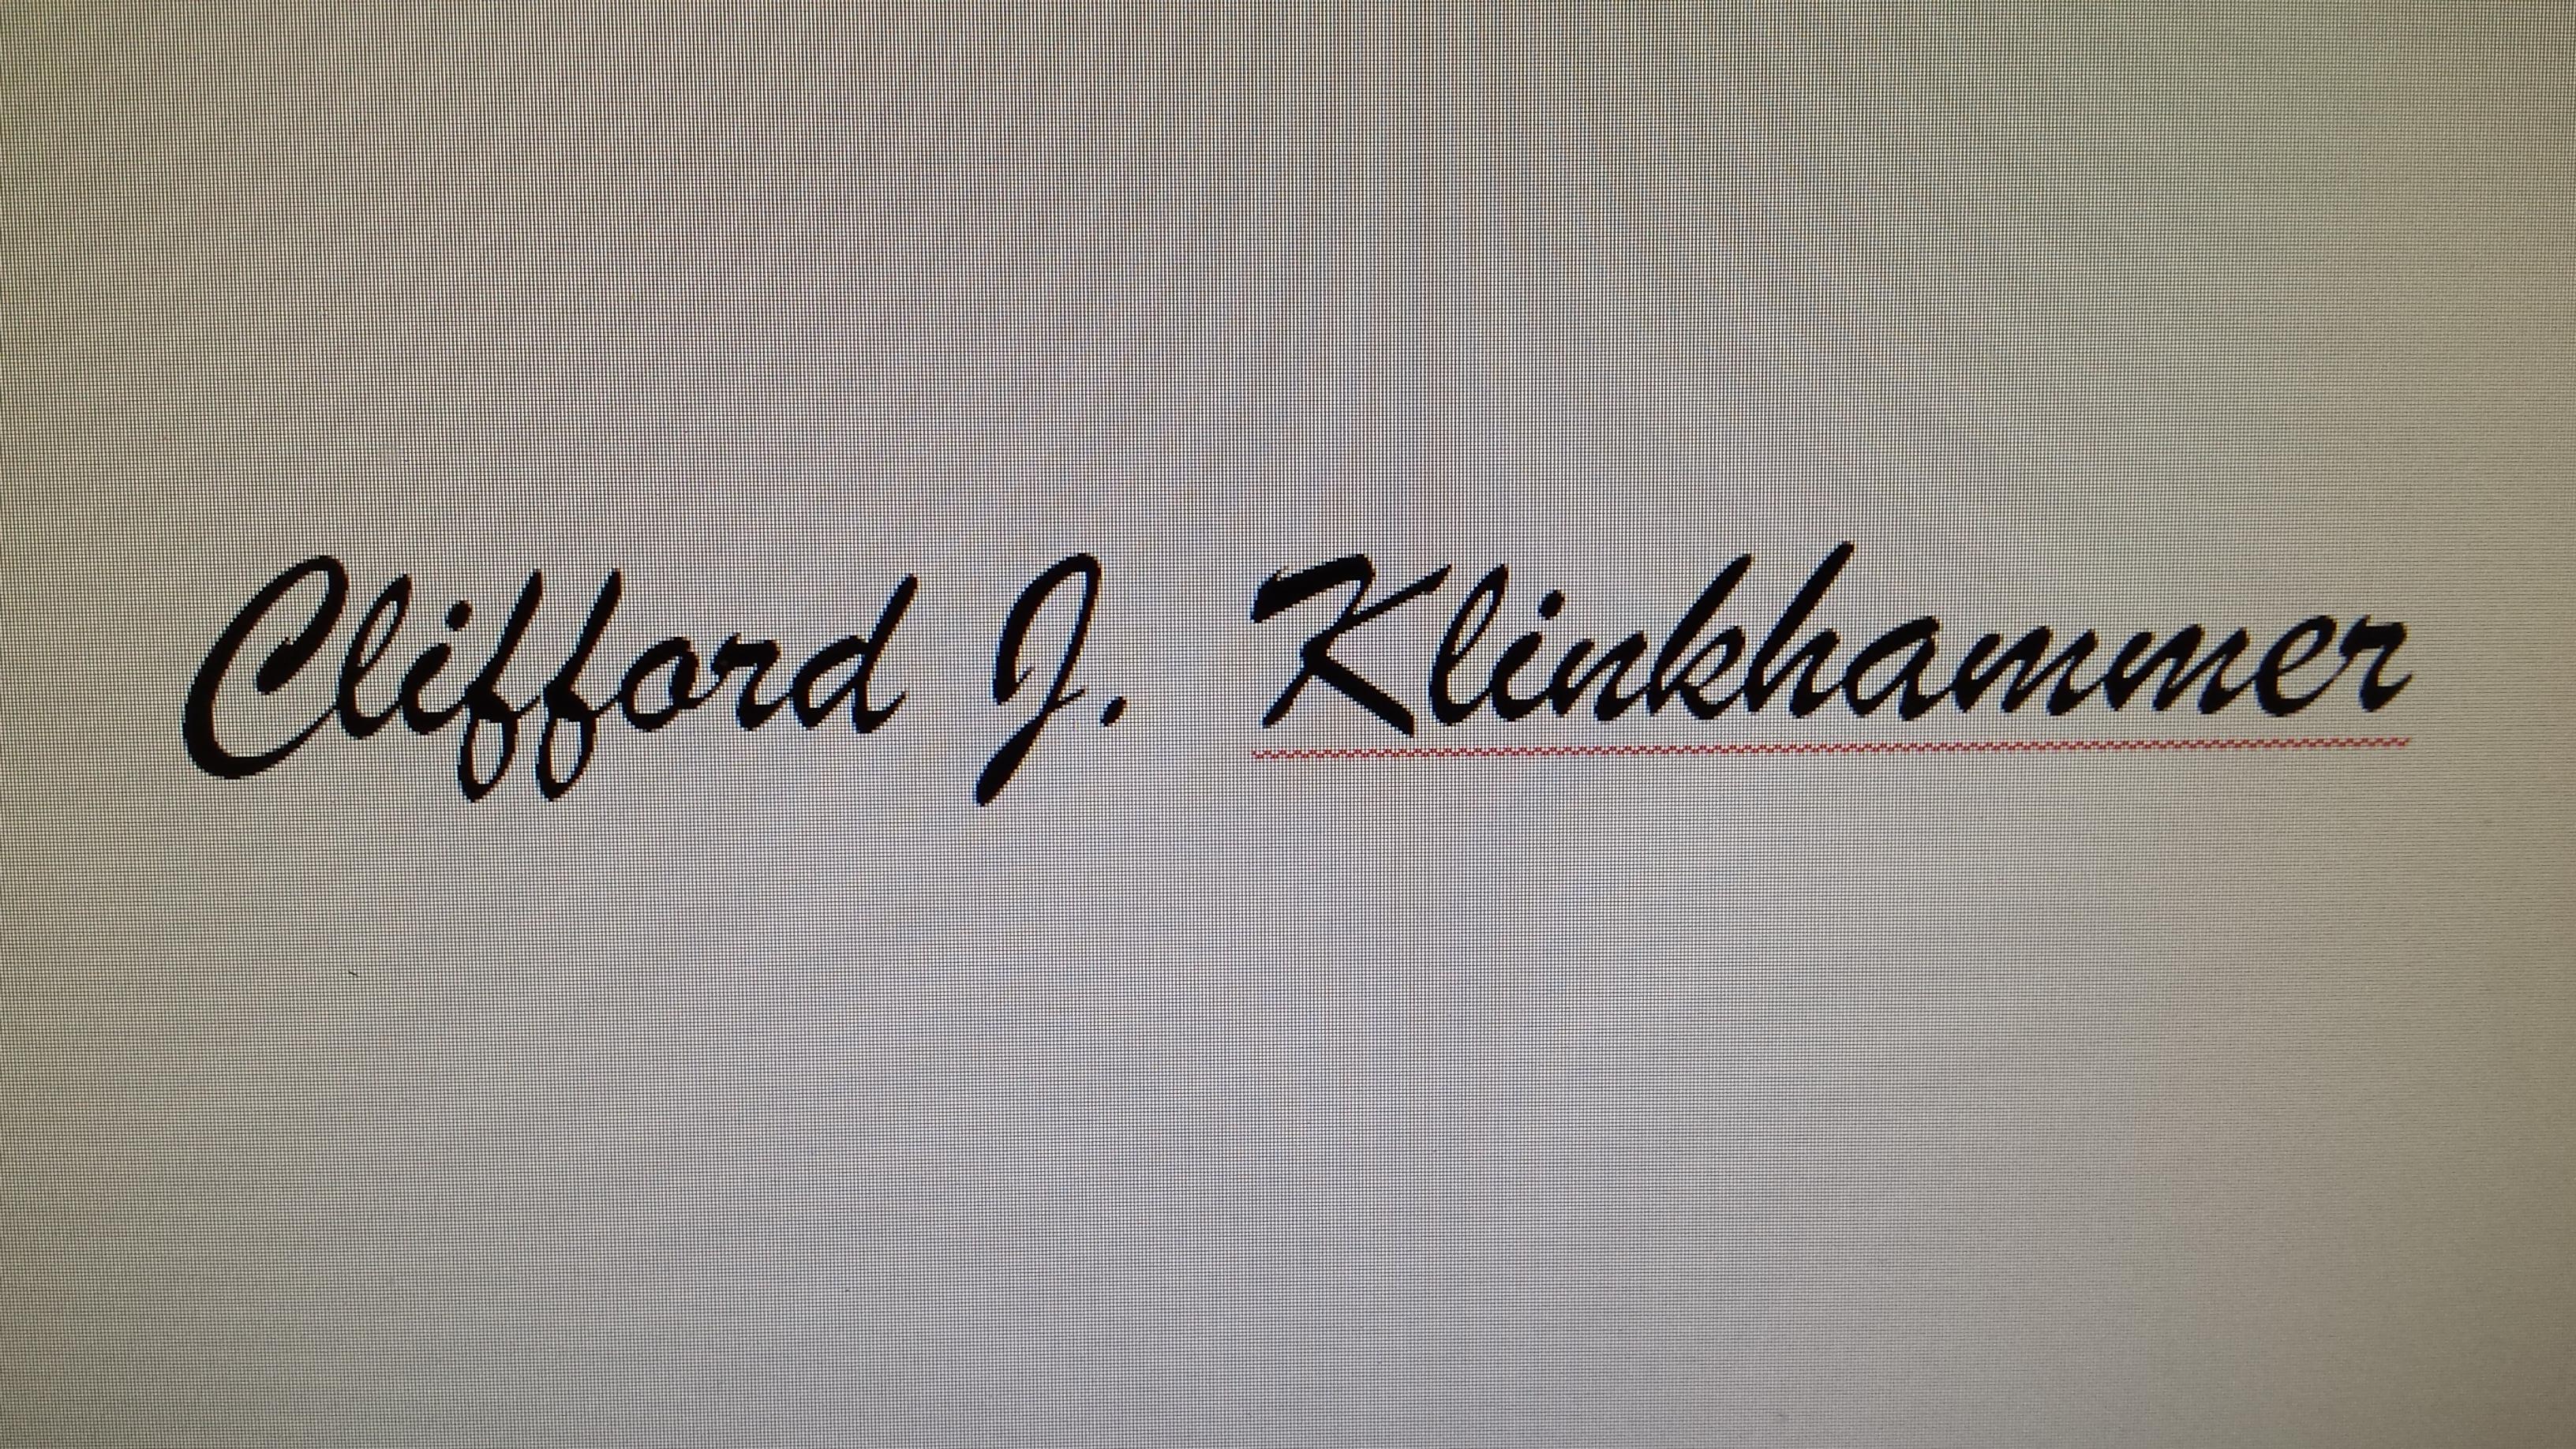 Clifford J. Klinkhammer's Signature